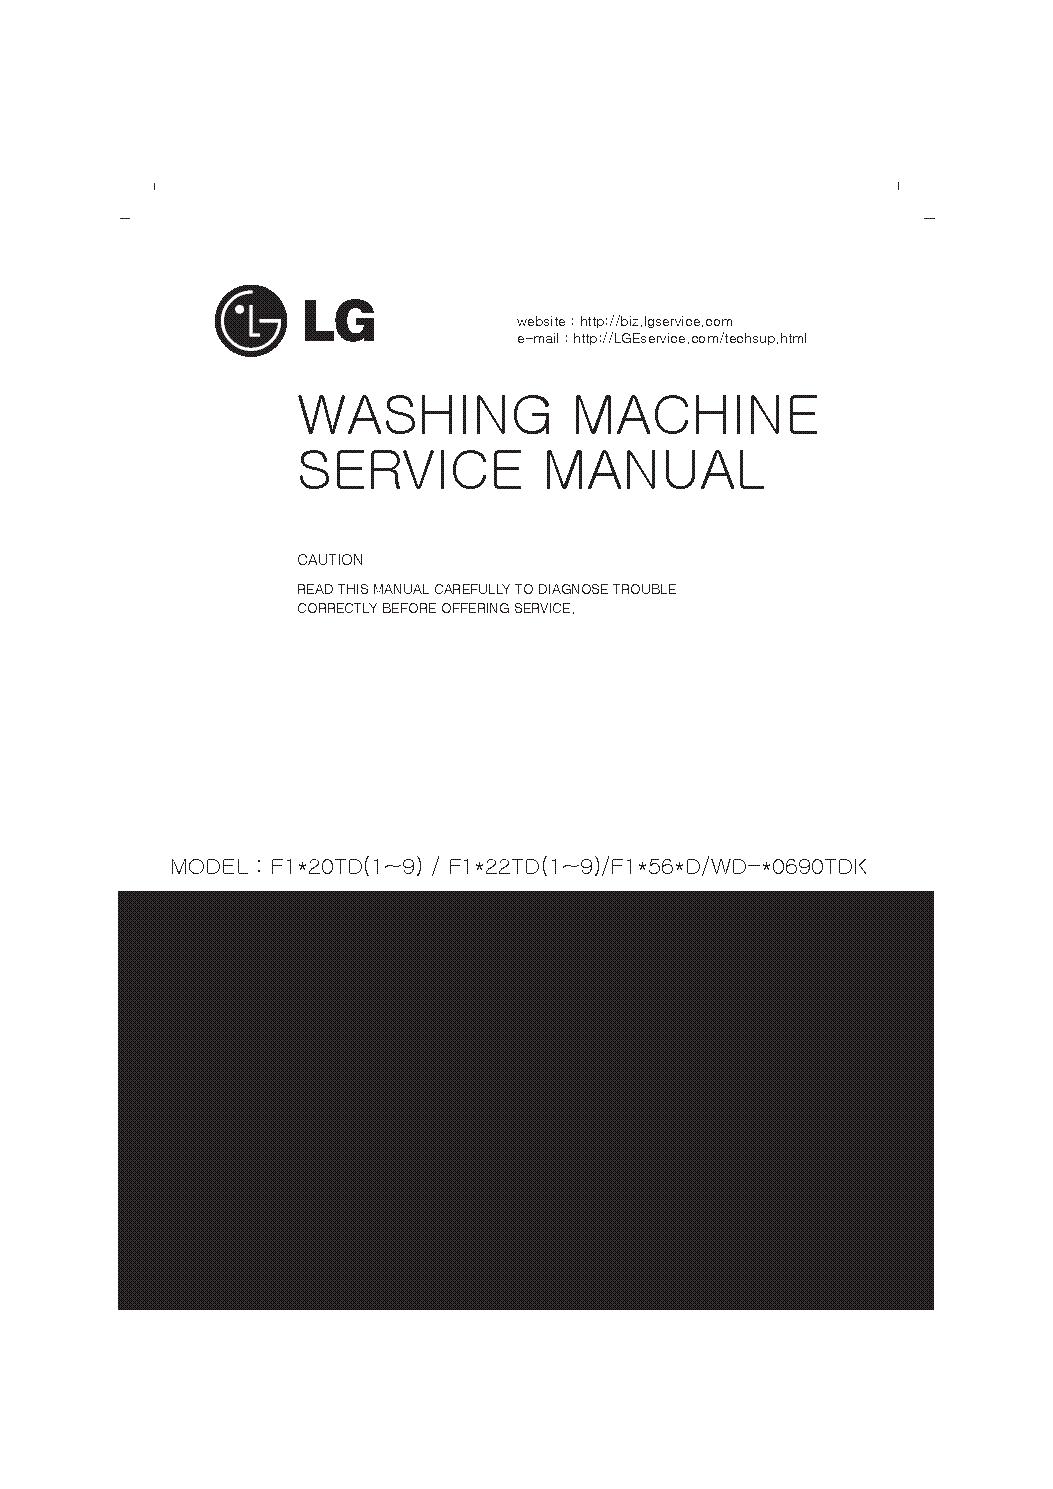 LG F1 20TD F1 22TD F1 56D WD WD- 0690TDK service manual (1st page